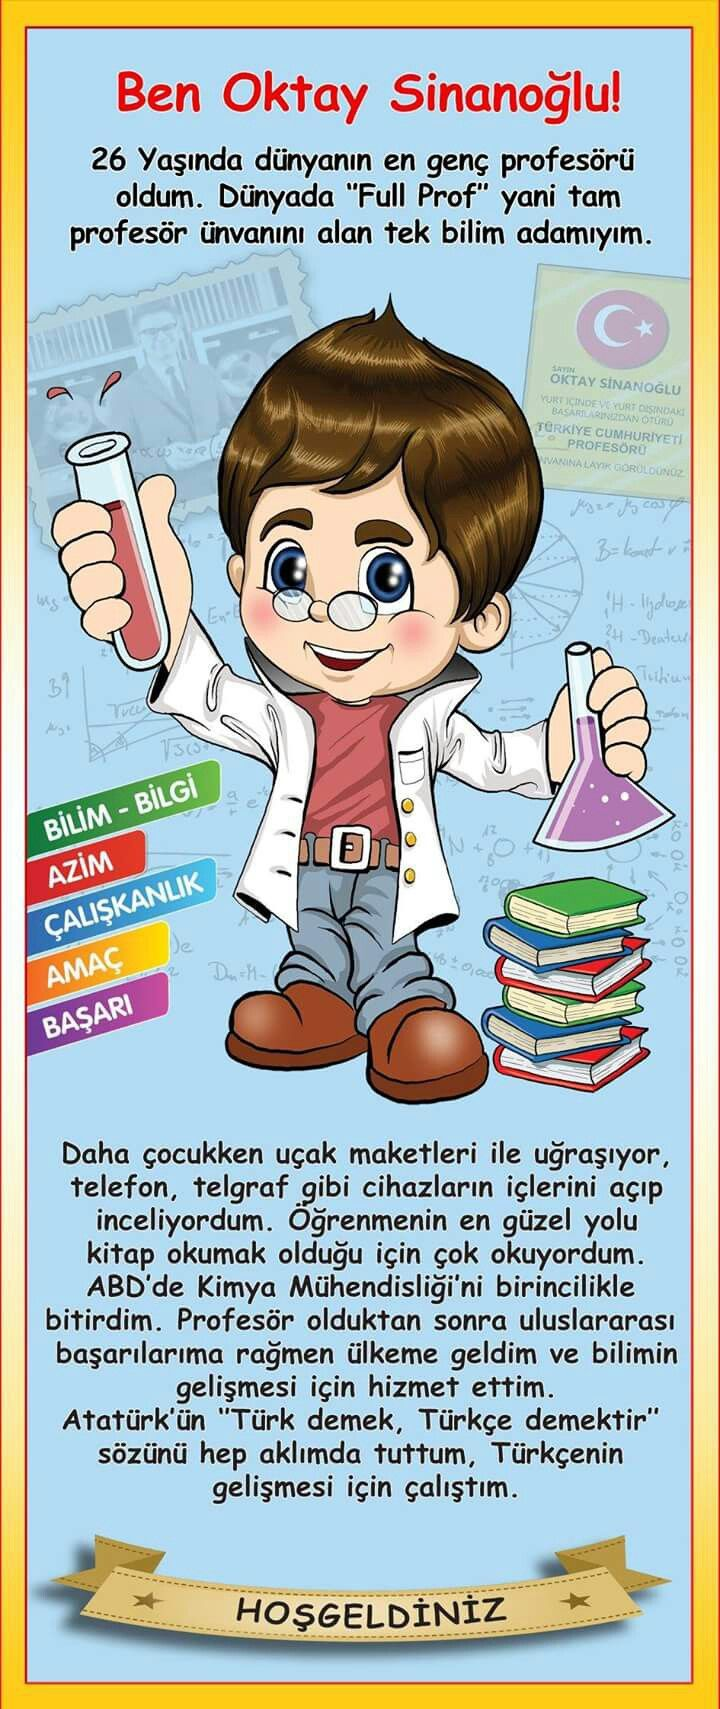 Oktay Sinanoğlu